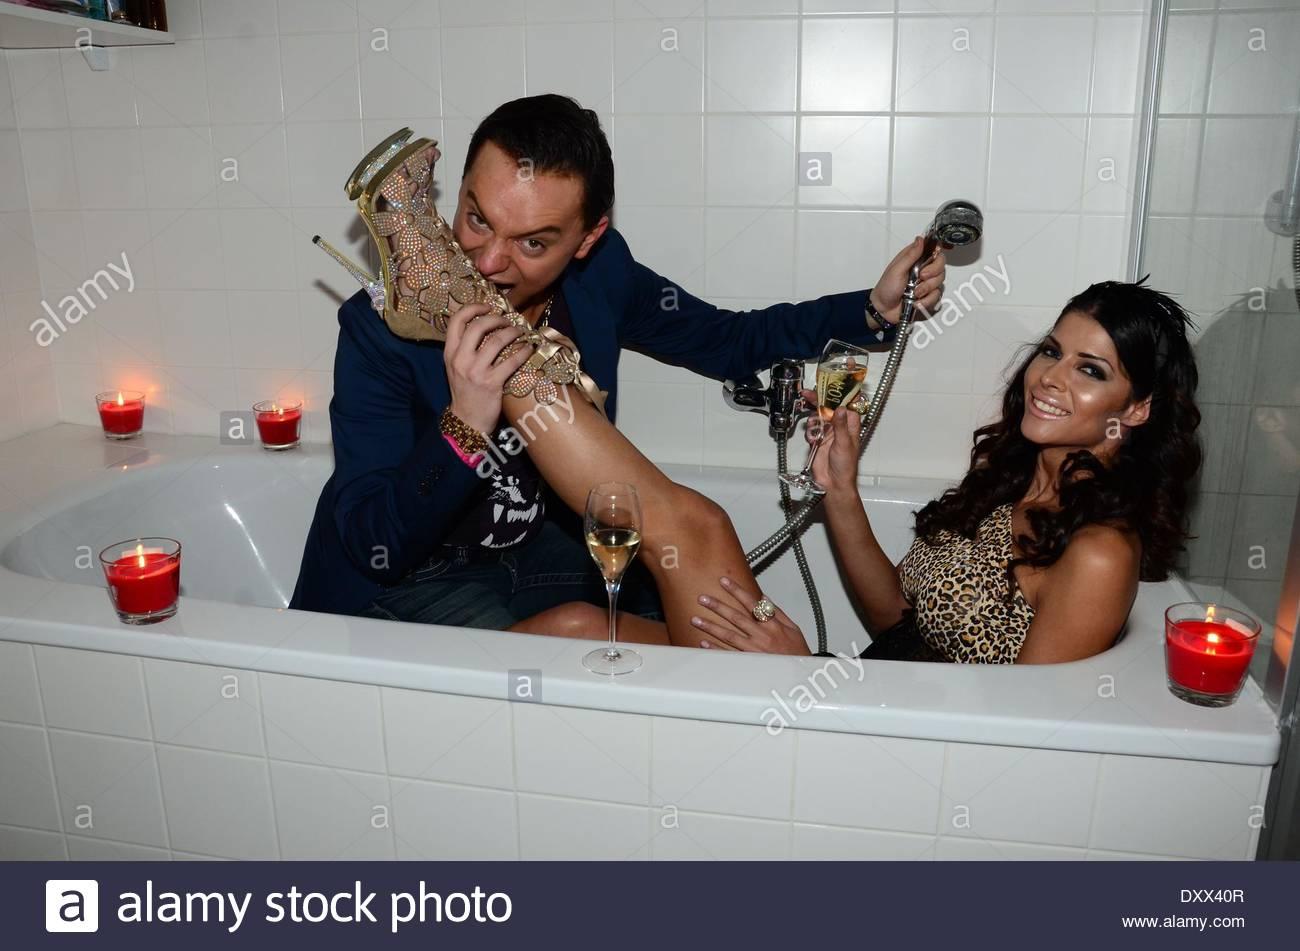 Micaela Schaefer and Julian Stoeckel in the bath tub at Star Press ...